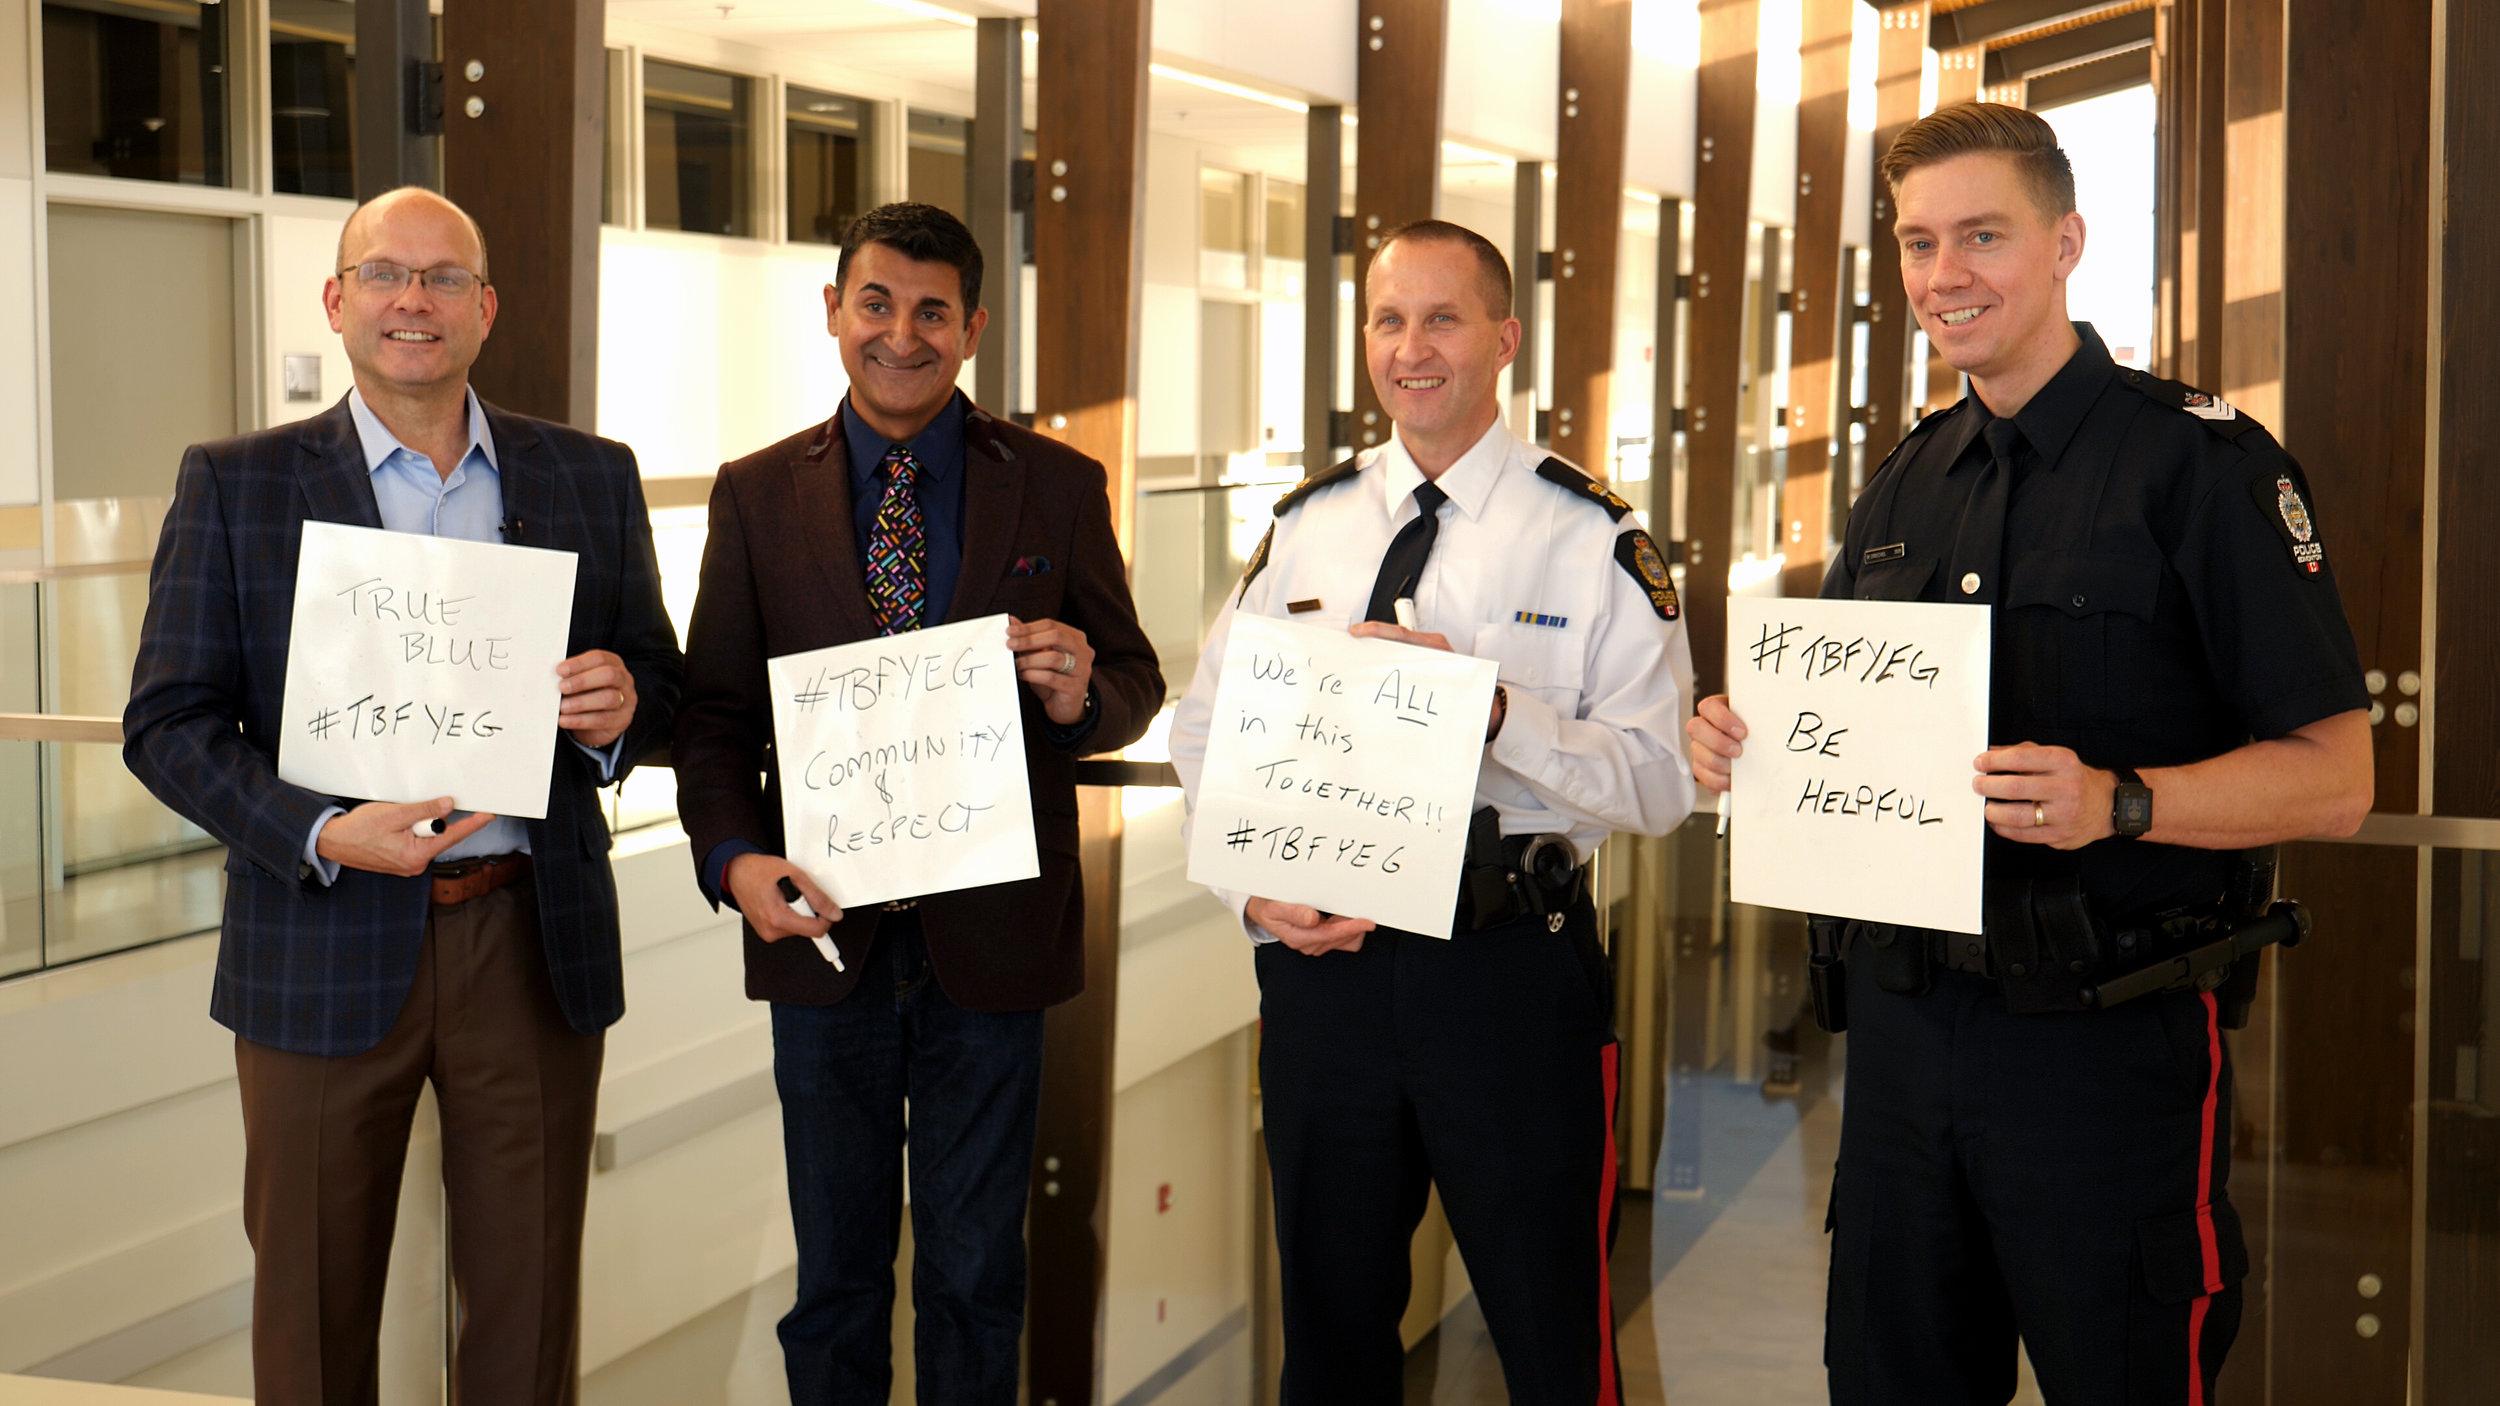 Oilers' Peter Chiarelli with Edmonton Police Foundation